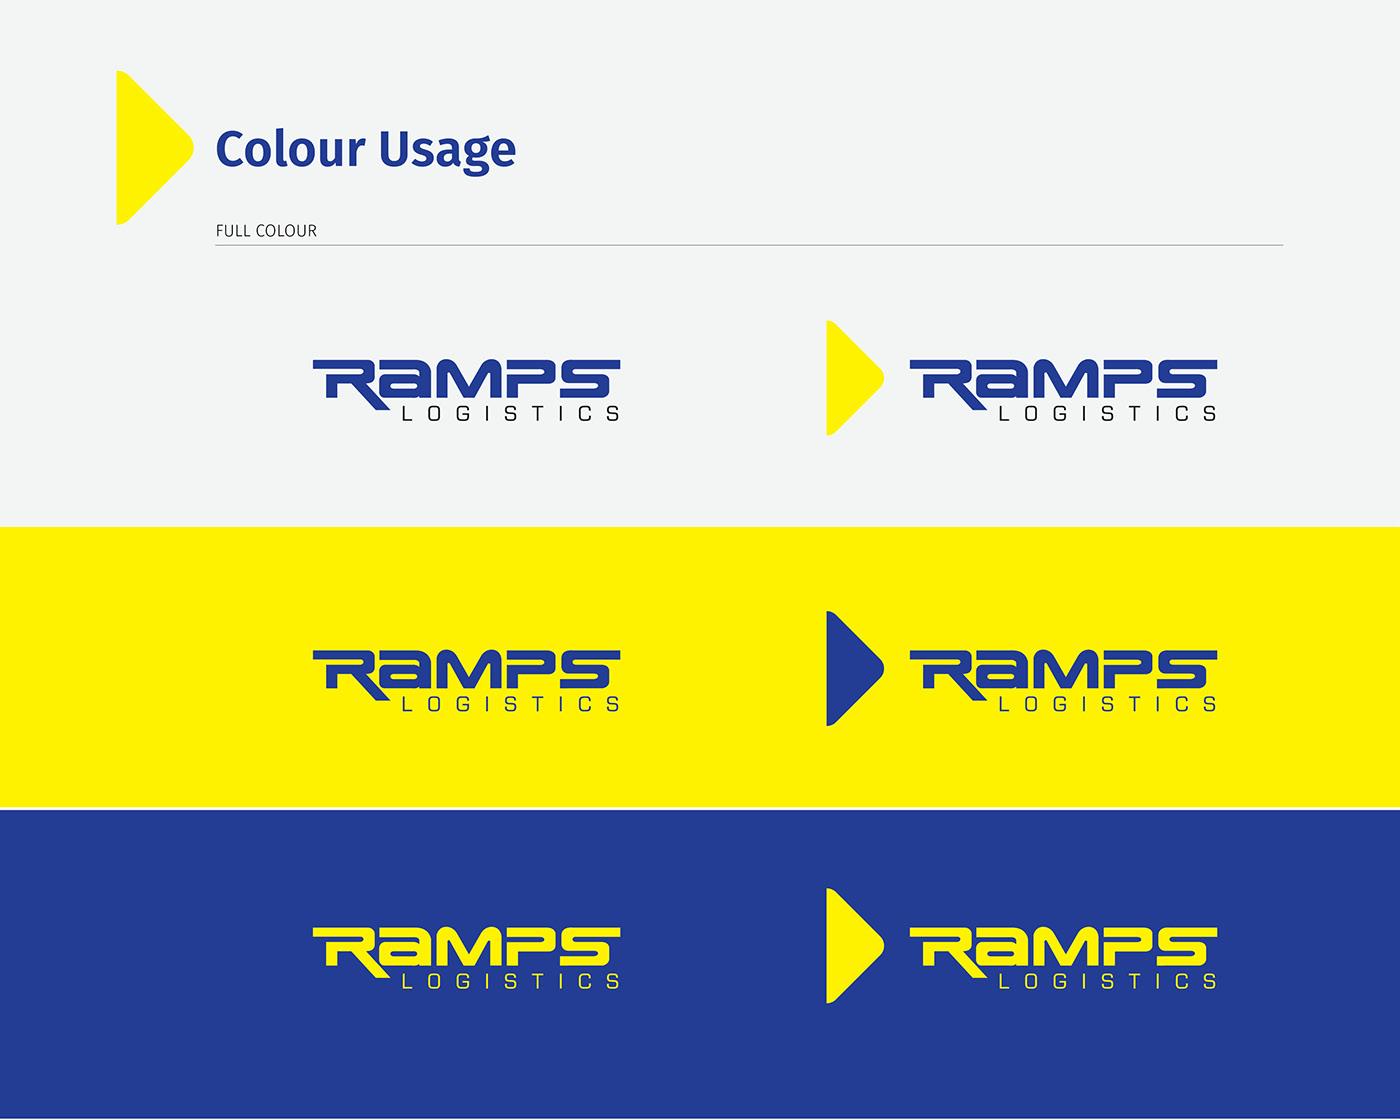 branding  Logistics logistic branding brand brand guide logo Identity Design design elements Trinidad